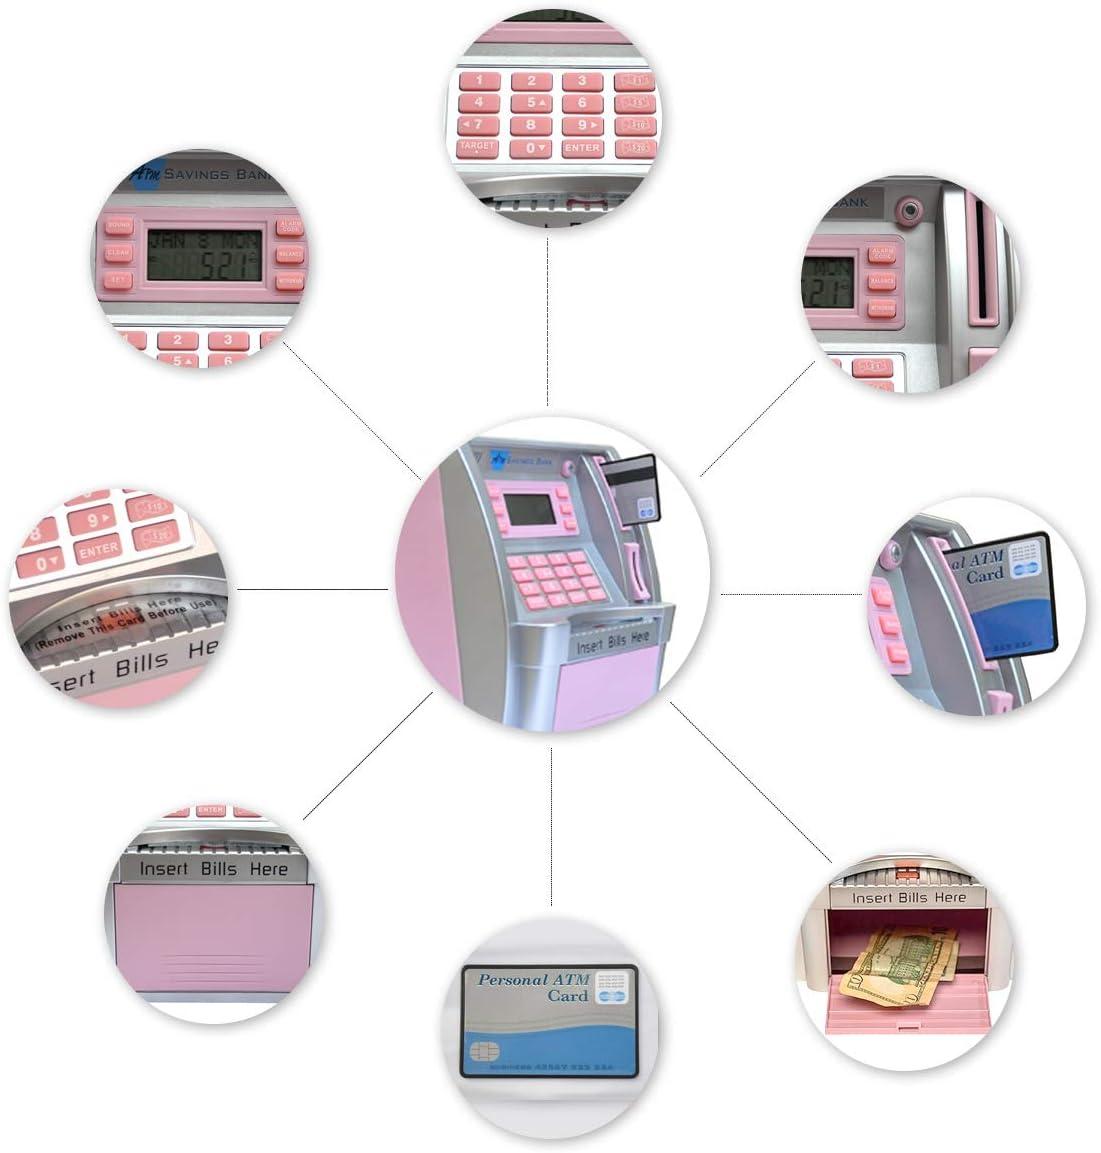 LB Children Kids Educational Toy ATM Savings Bank Electronic Mini ATM Piggy Bank Cash Coin Money Saving Machine for Boys Girls Birthday Gift